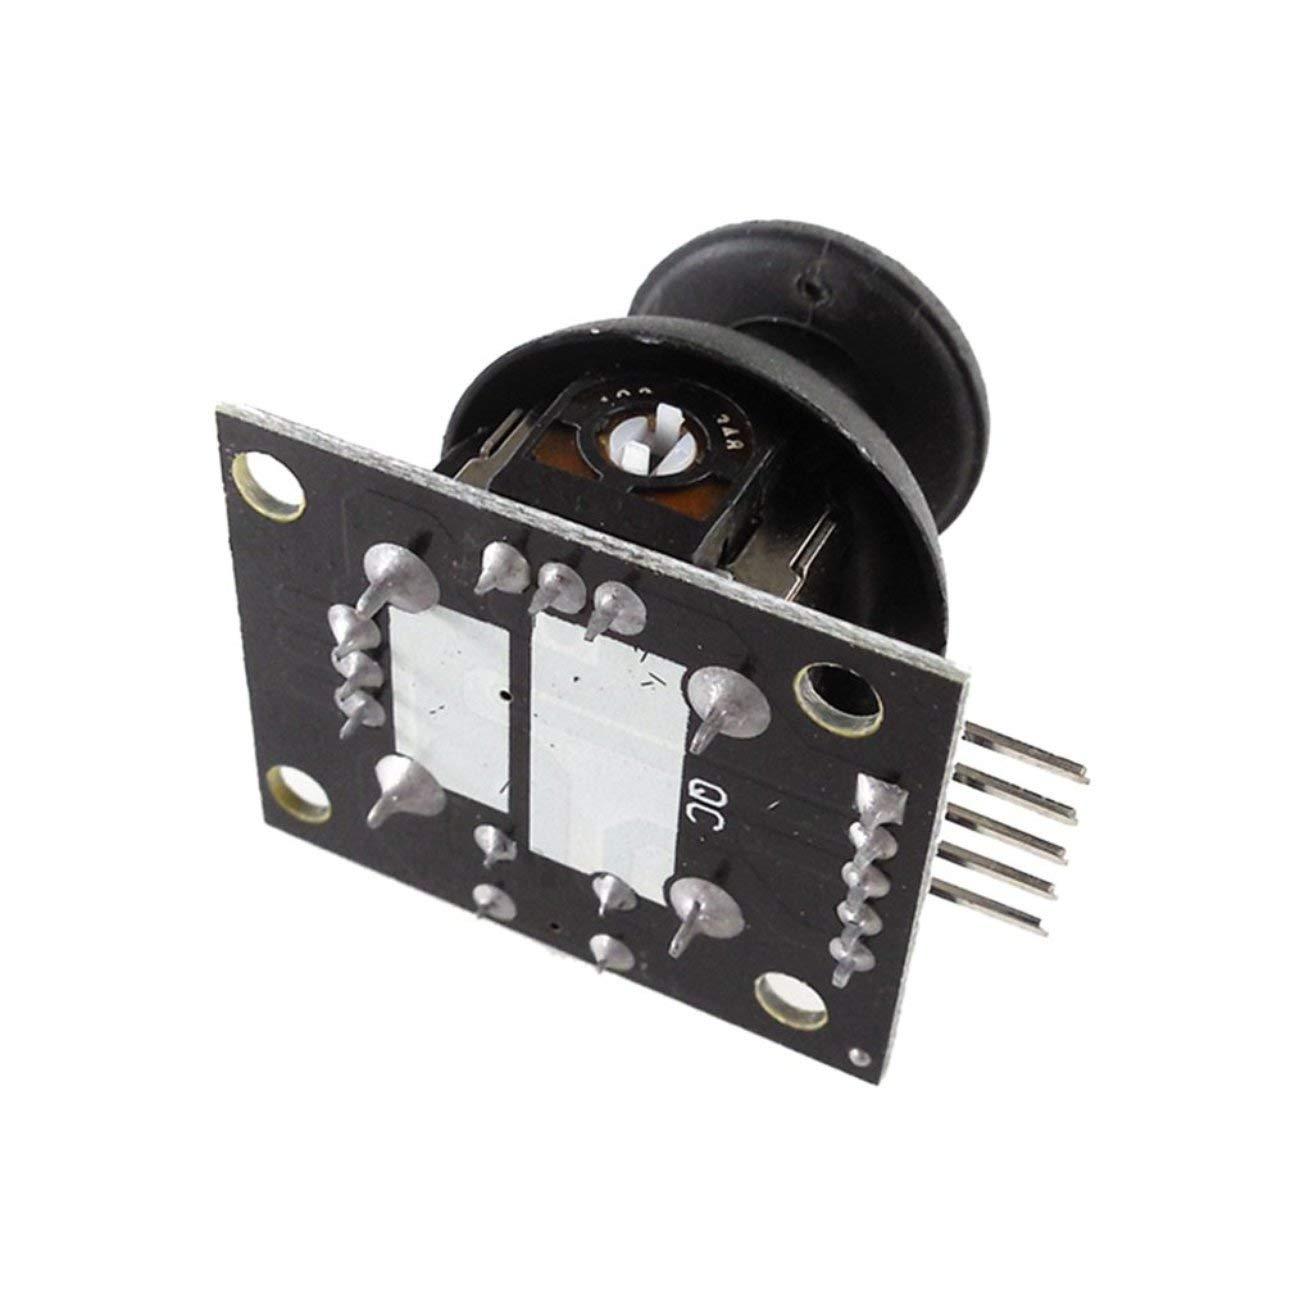 HW-504 Joystick Breakout Modul Shield f/ür PS2 Joystick Game Controller Spiel Wipphebel Sensor Modul F/ür Arduino